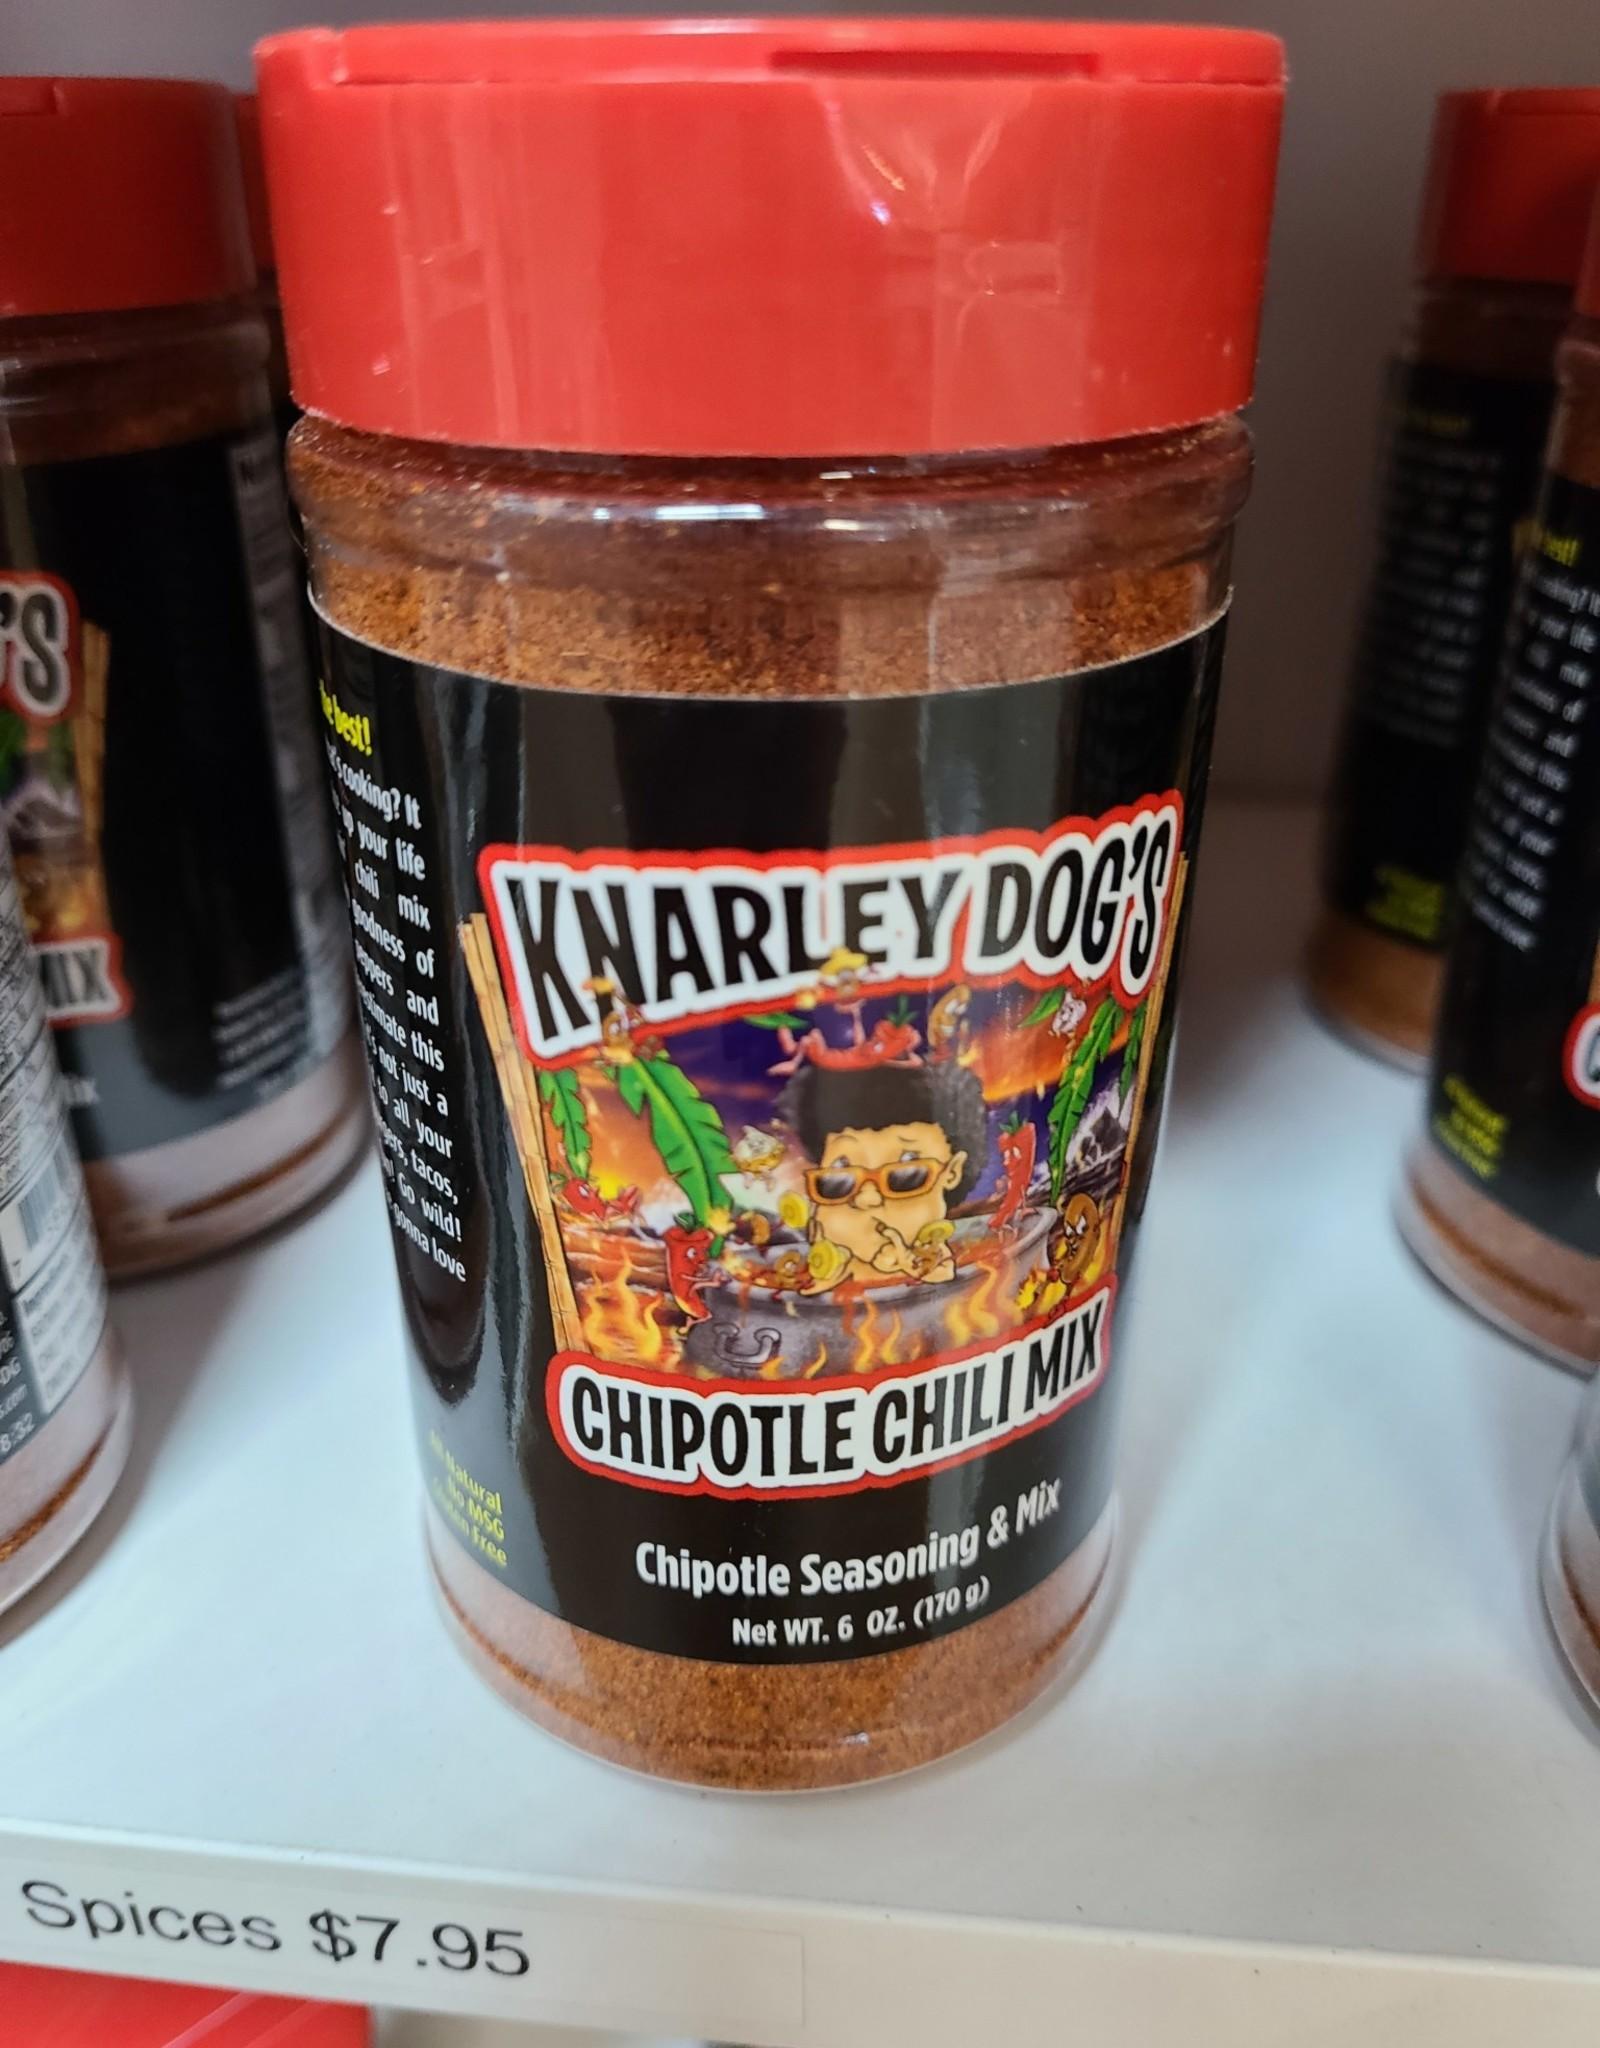 Knarley Dog's Chipotle Seasoning